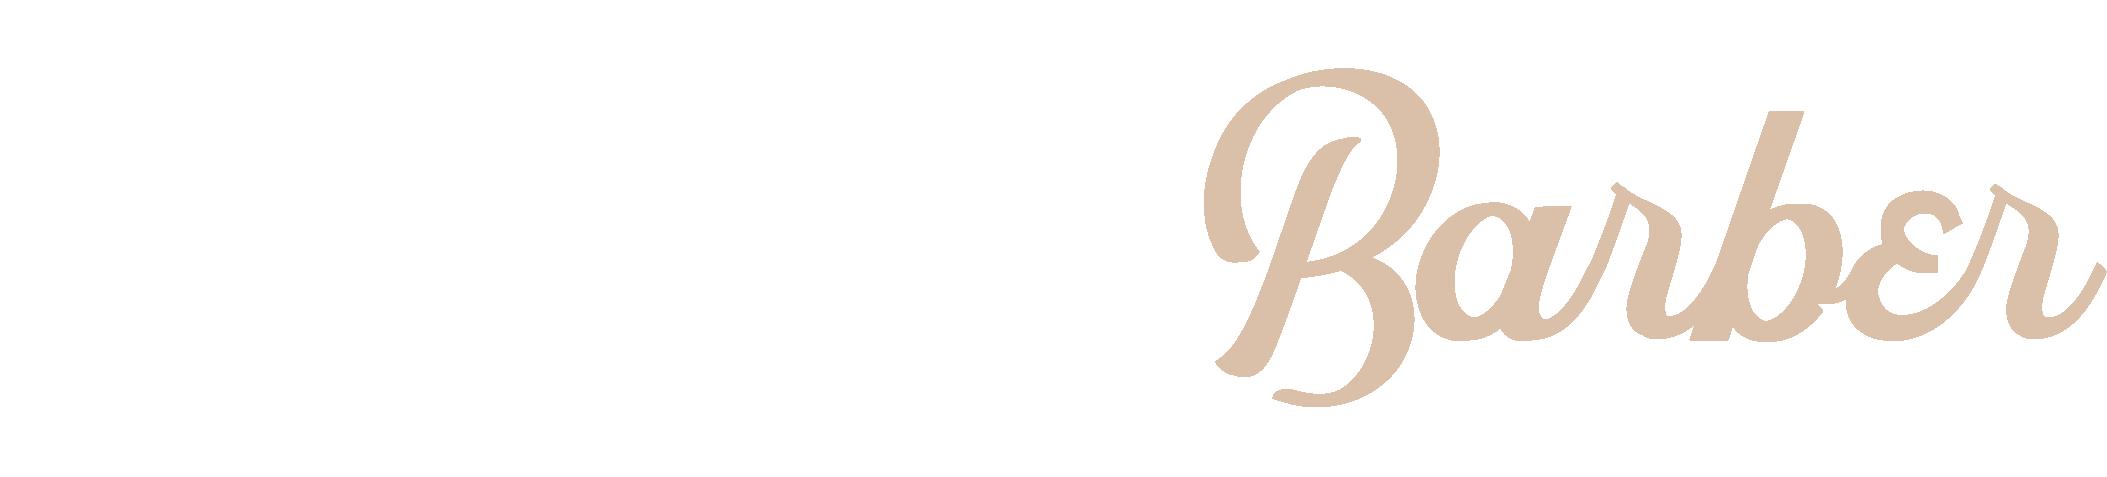 DailyBarber Logo